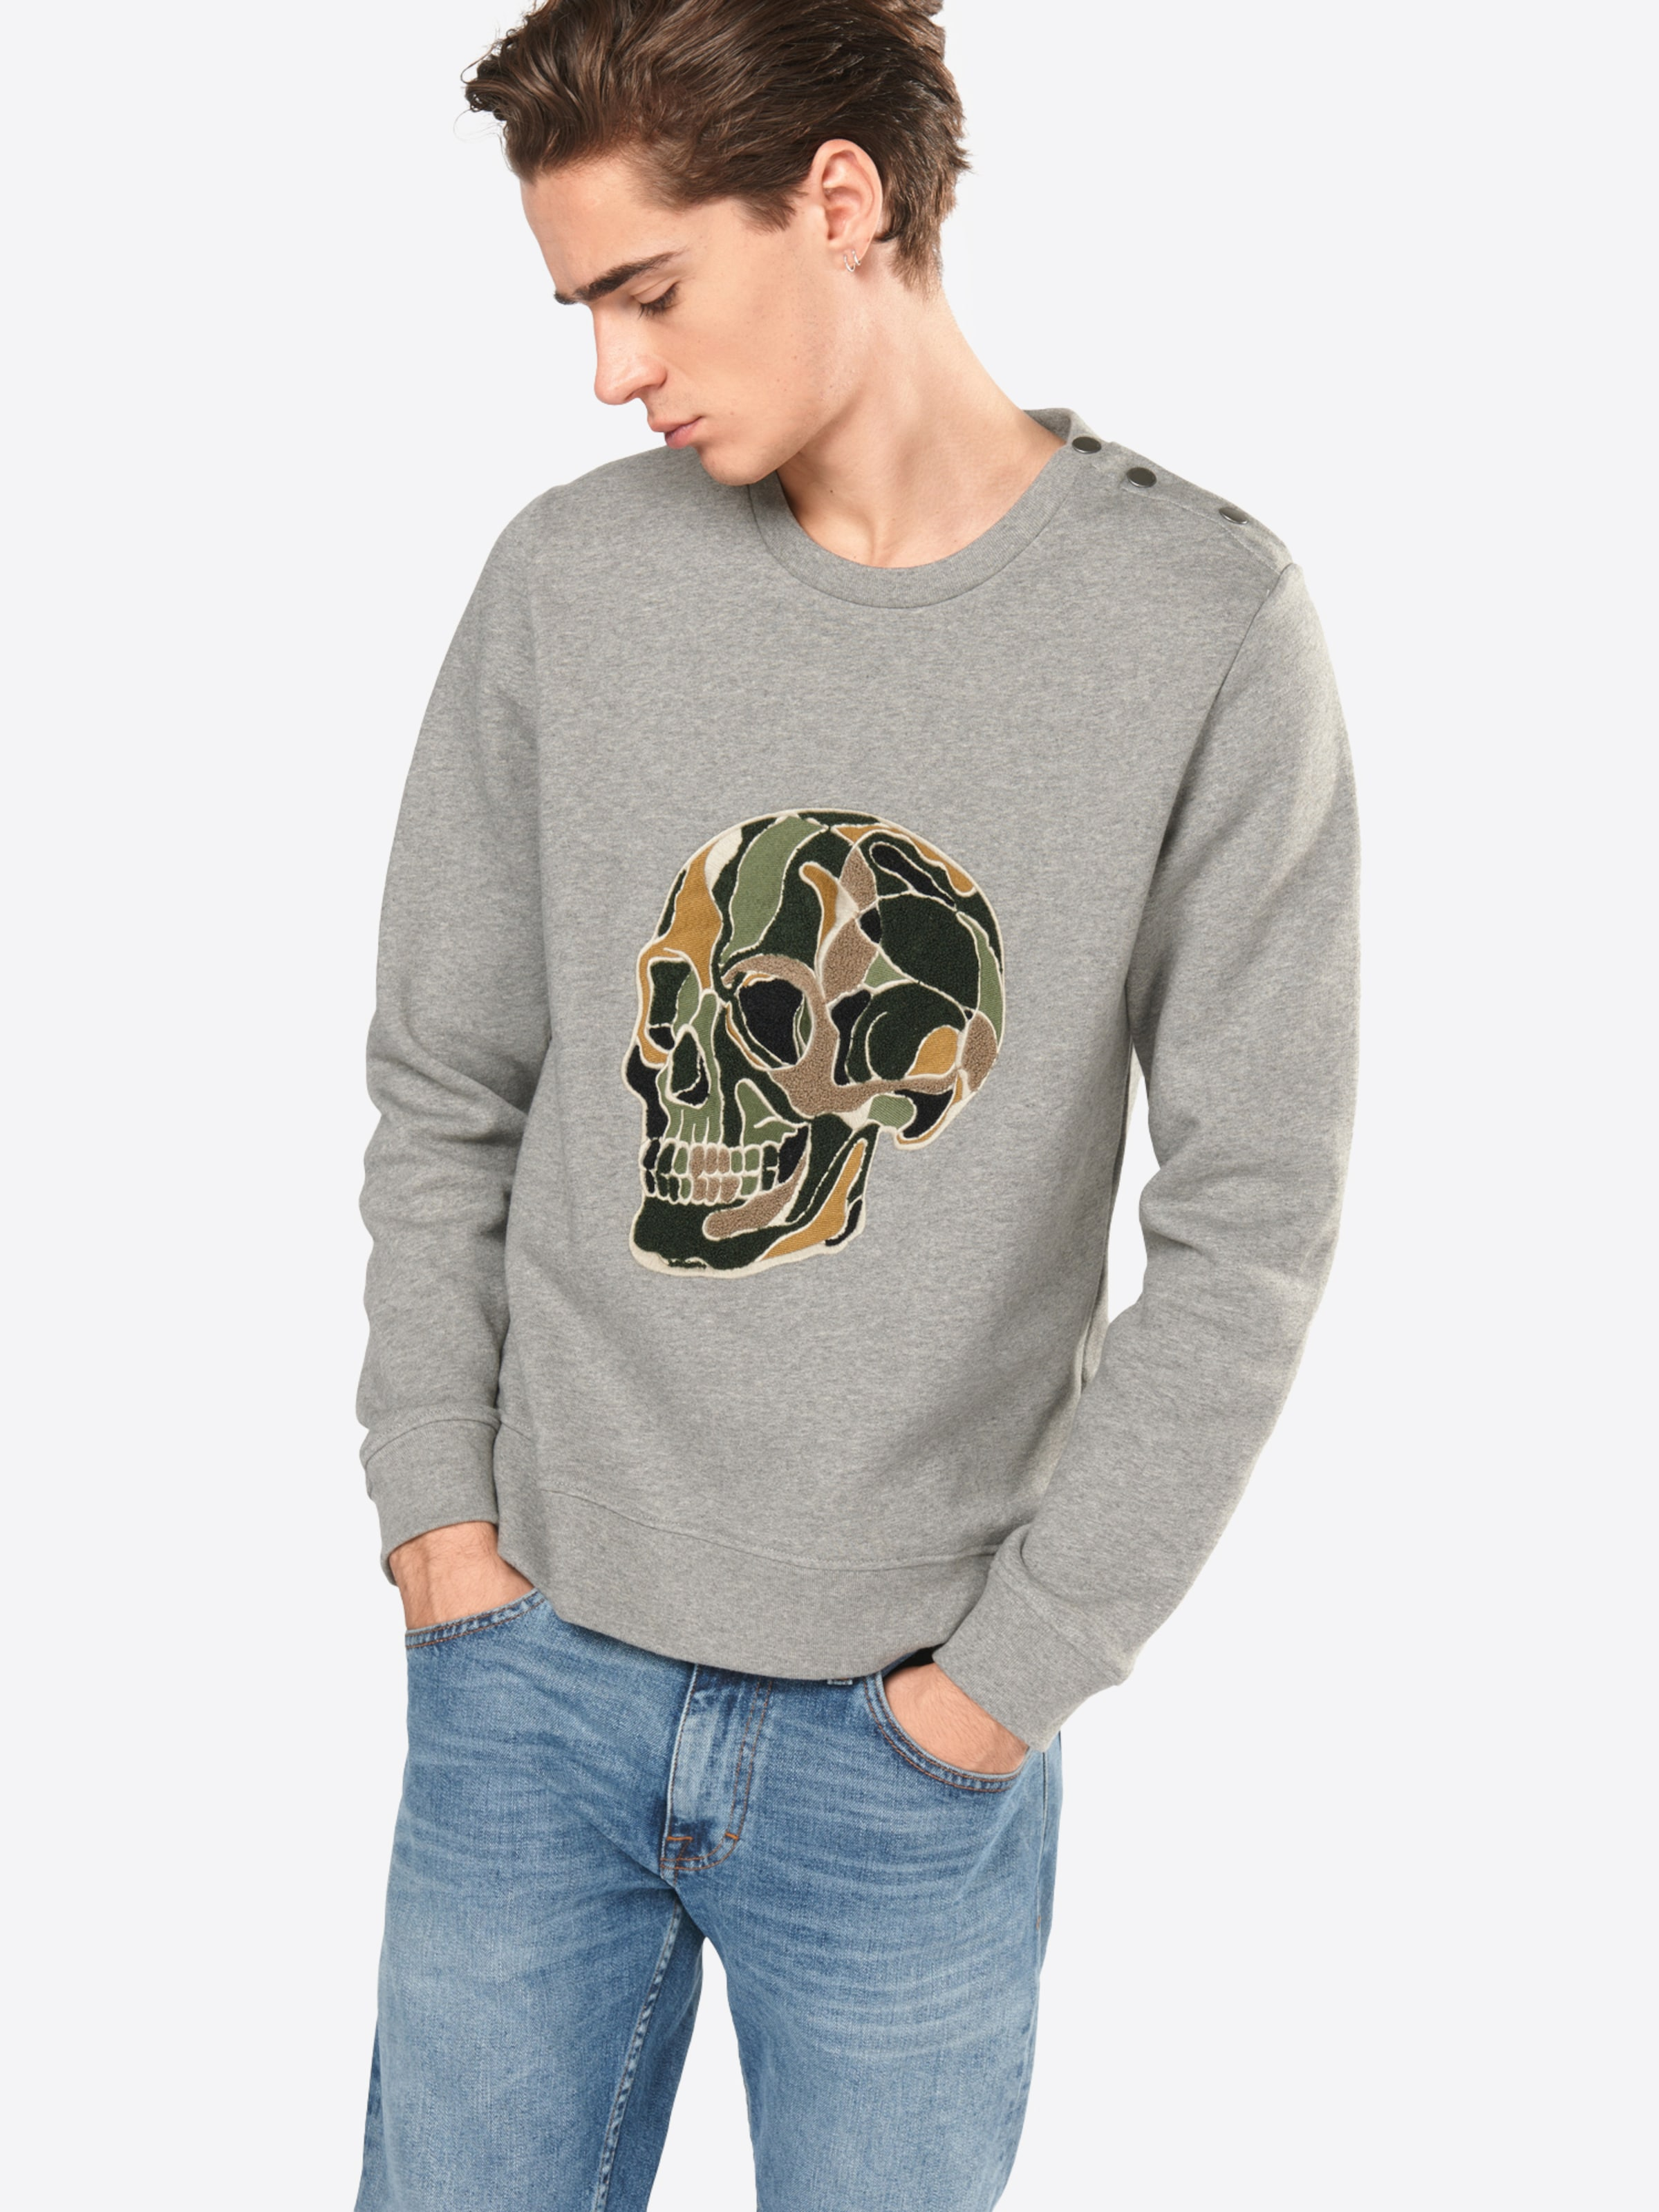 THE KOOPLES SPORT Sweatshirt 'Fleece & Skull Embroidery' mit Totenkopfstickerei Rabatt Neueste a0lzW1e